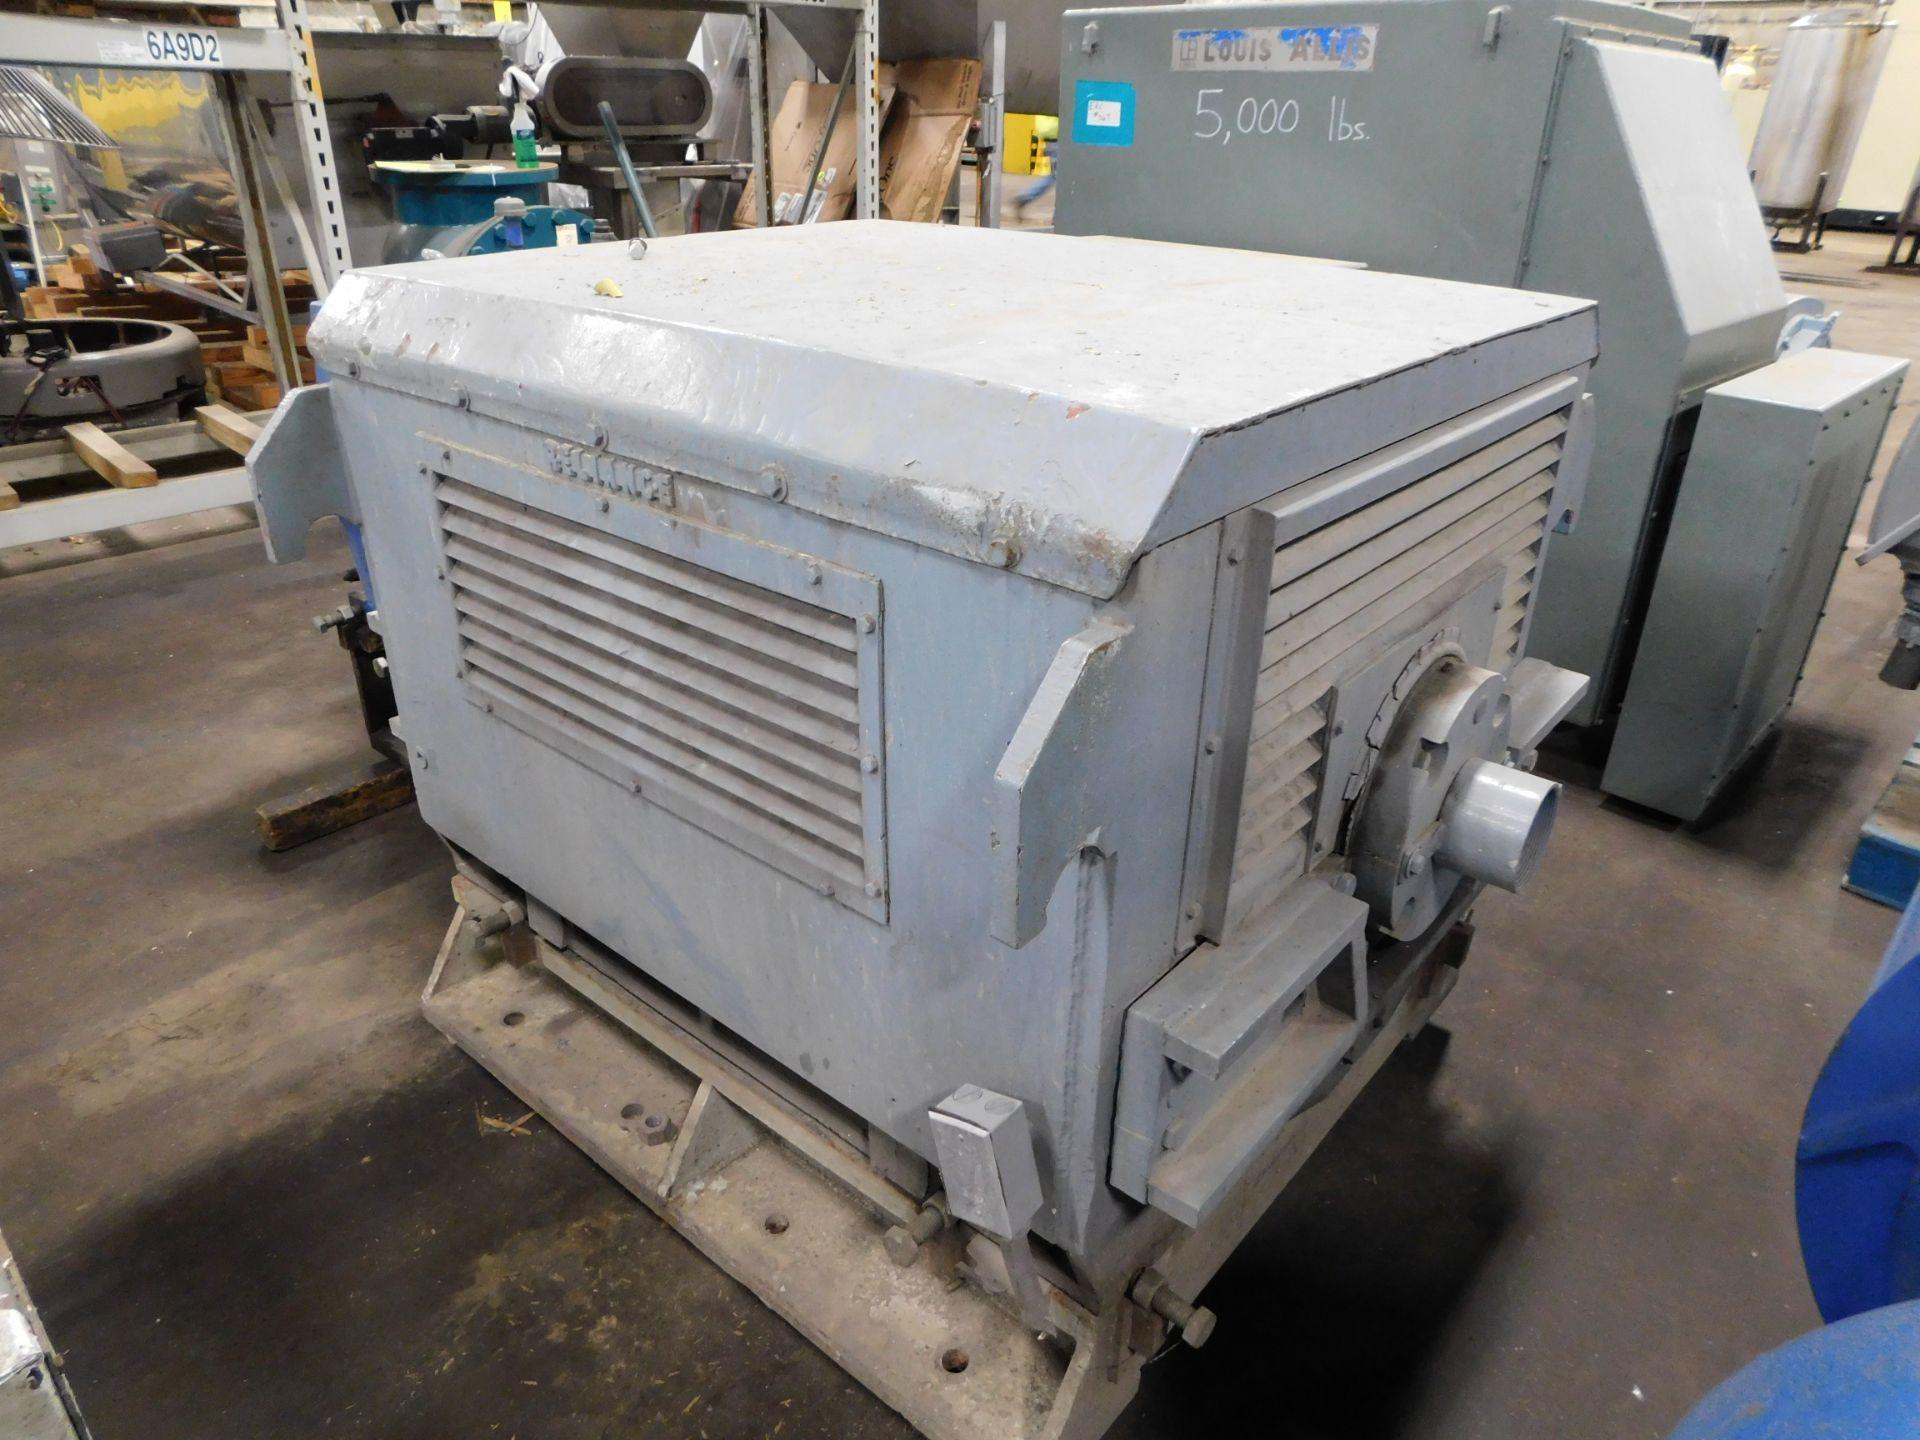 Reliance AC Duty Master Motor. 900 HP. 3 Ph. 60 Hz. 4160 V. 1789 RPM. 6809S. Type P. - Image 3 of 8